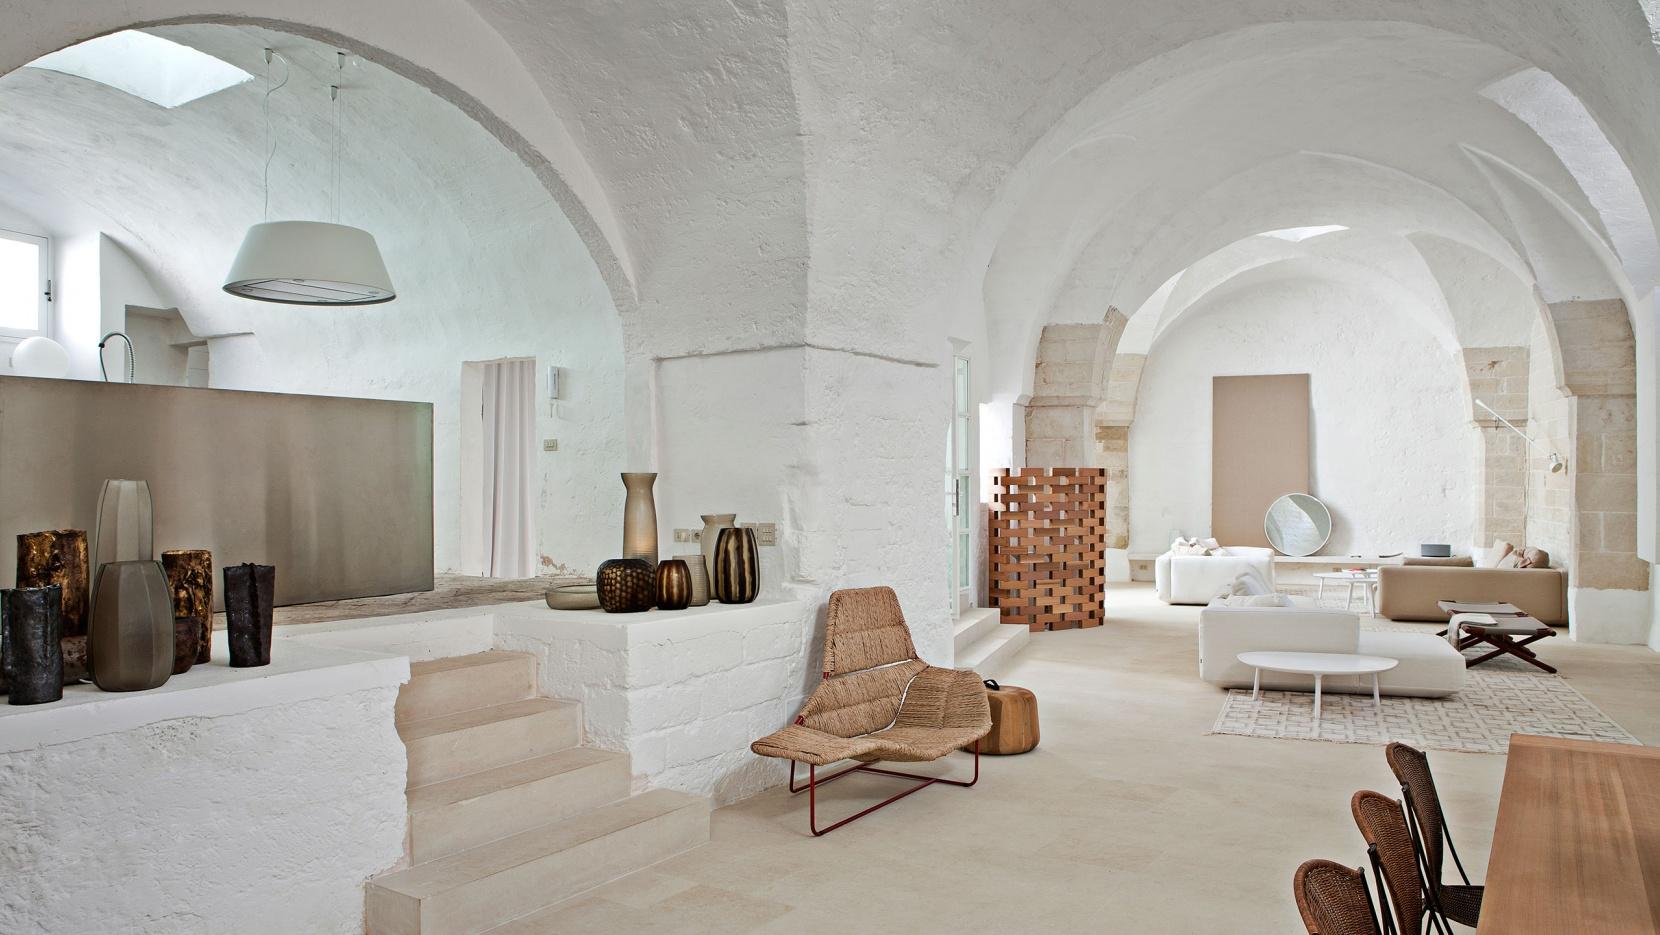 Palomba serafini house interior